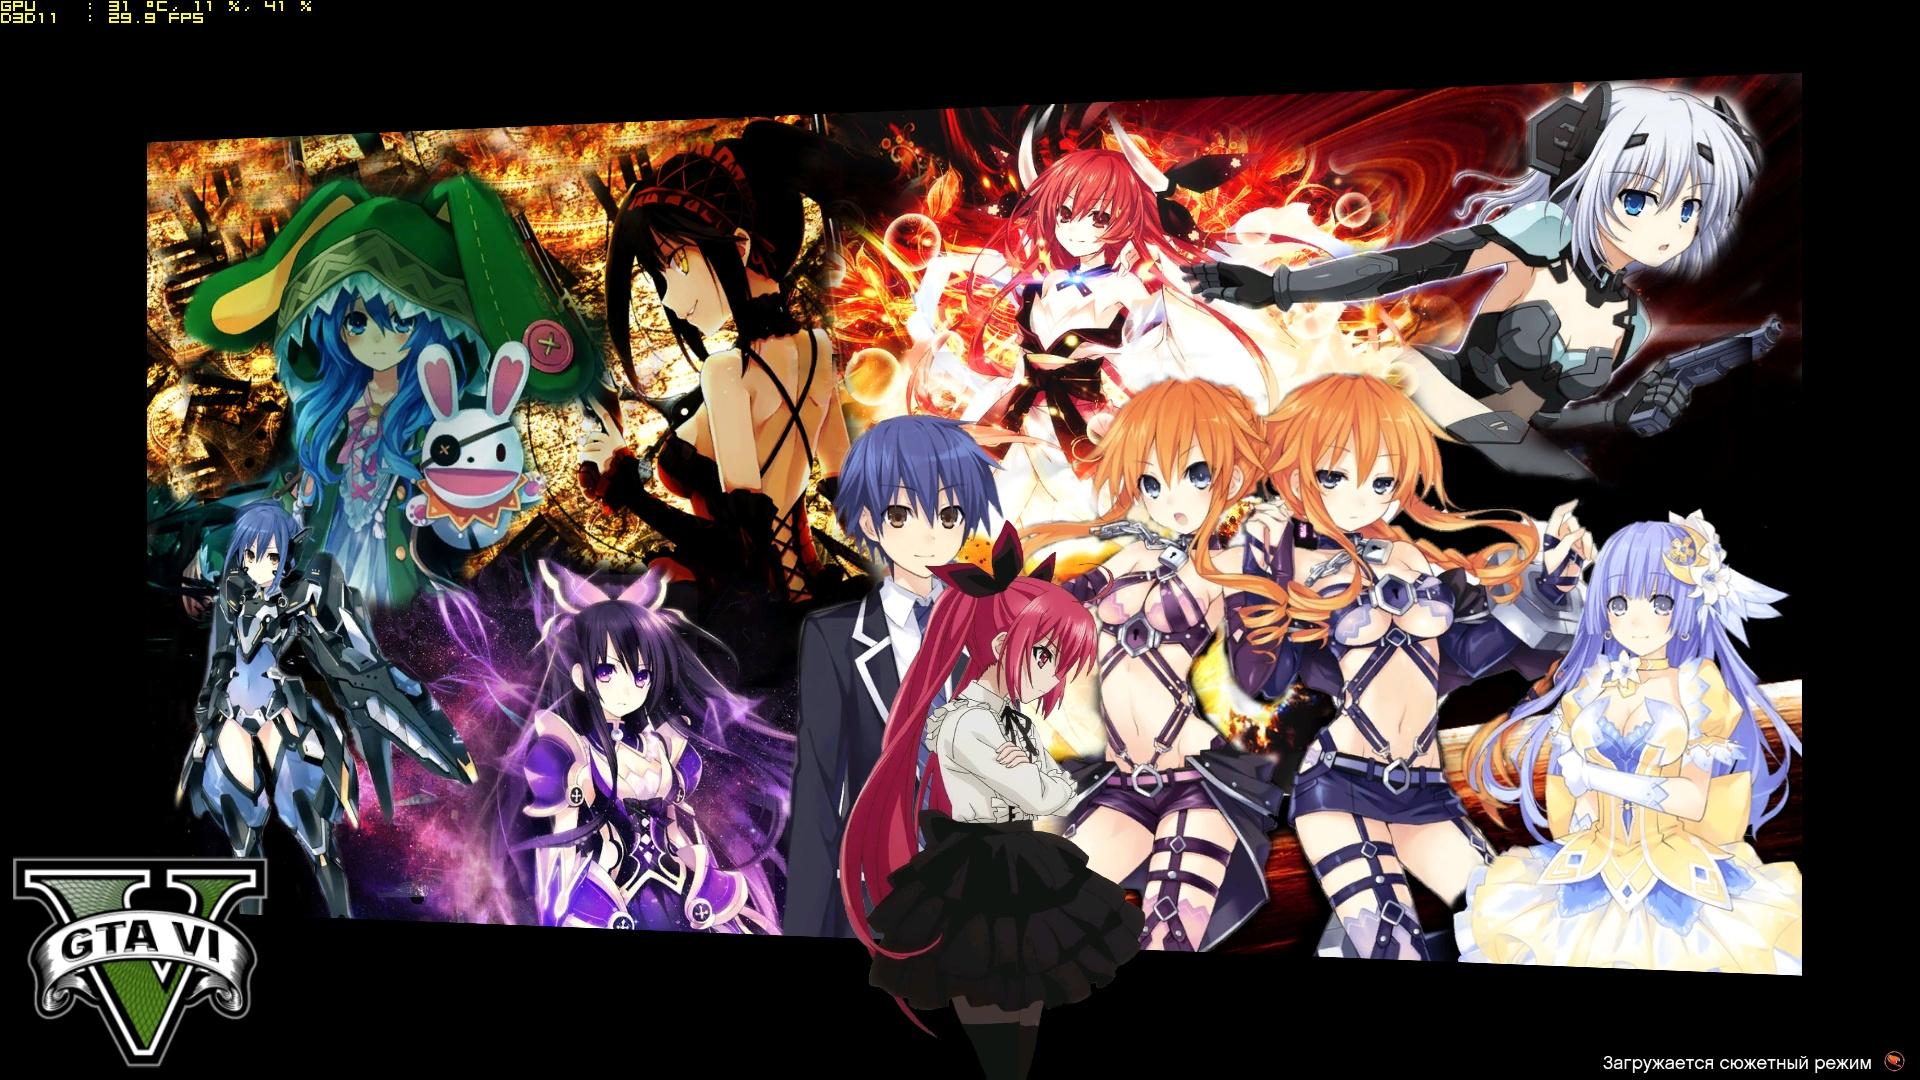 show Gta 5 anime